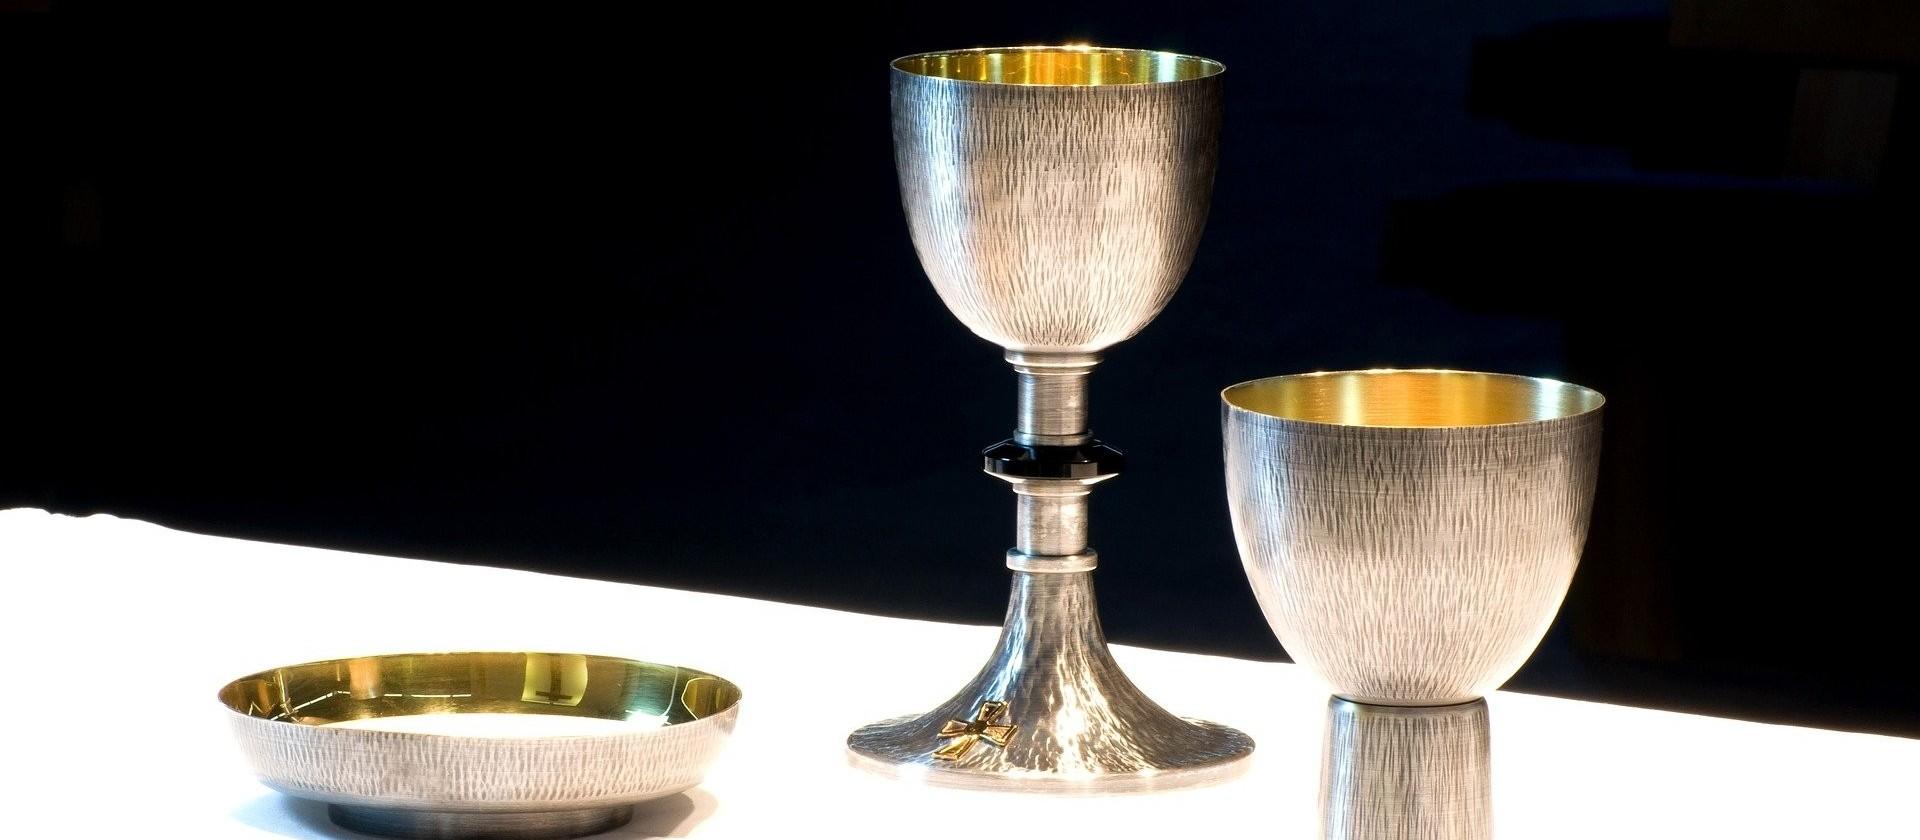 Carreata de Corpus Christi inicia às 15h